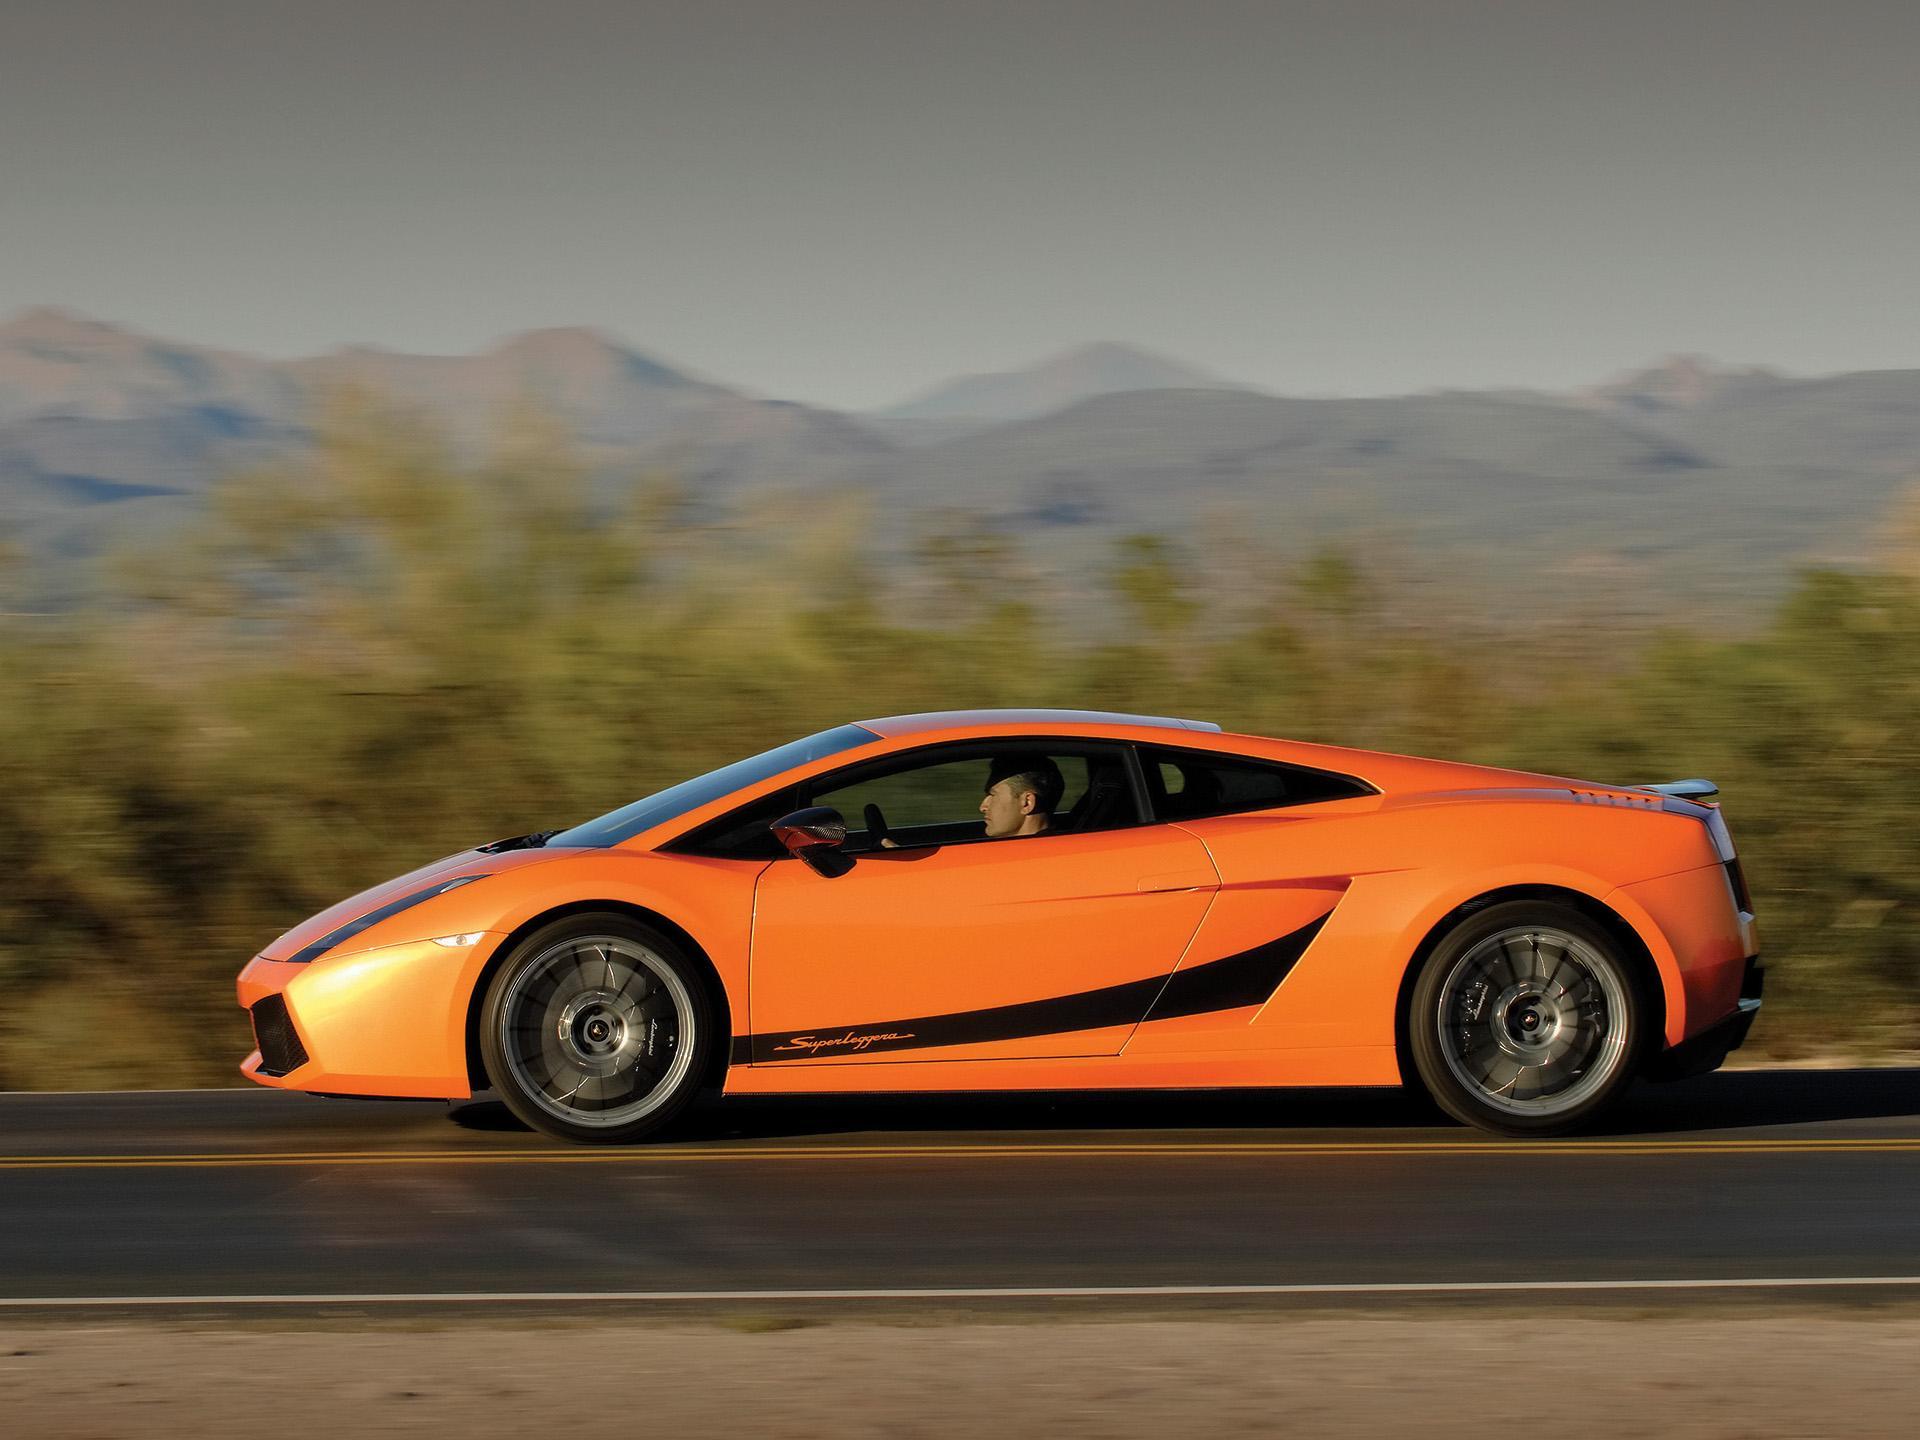 2008 Lamborghini Gallardo Superleggera Image Photo 40 Of 43